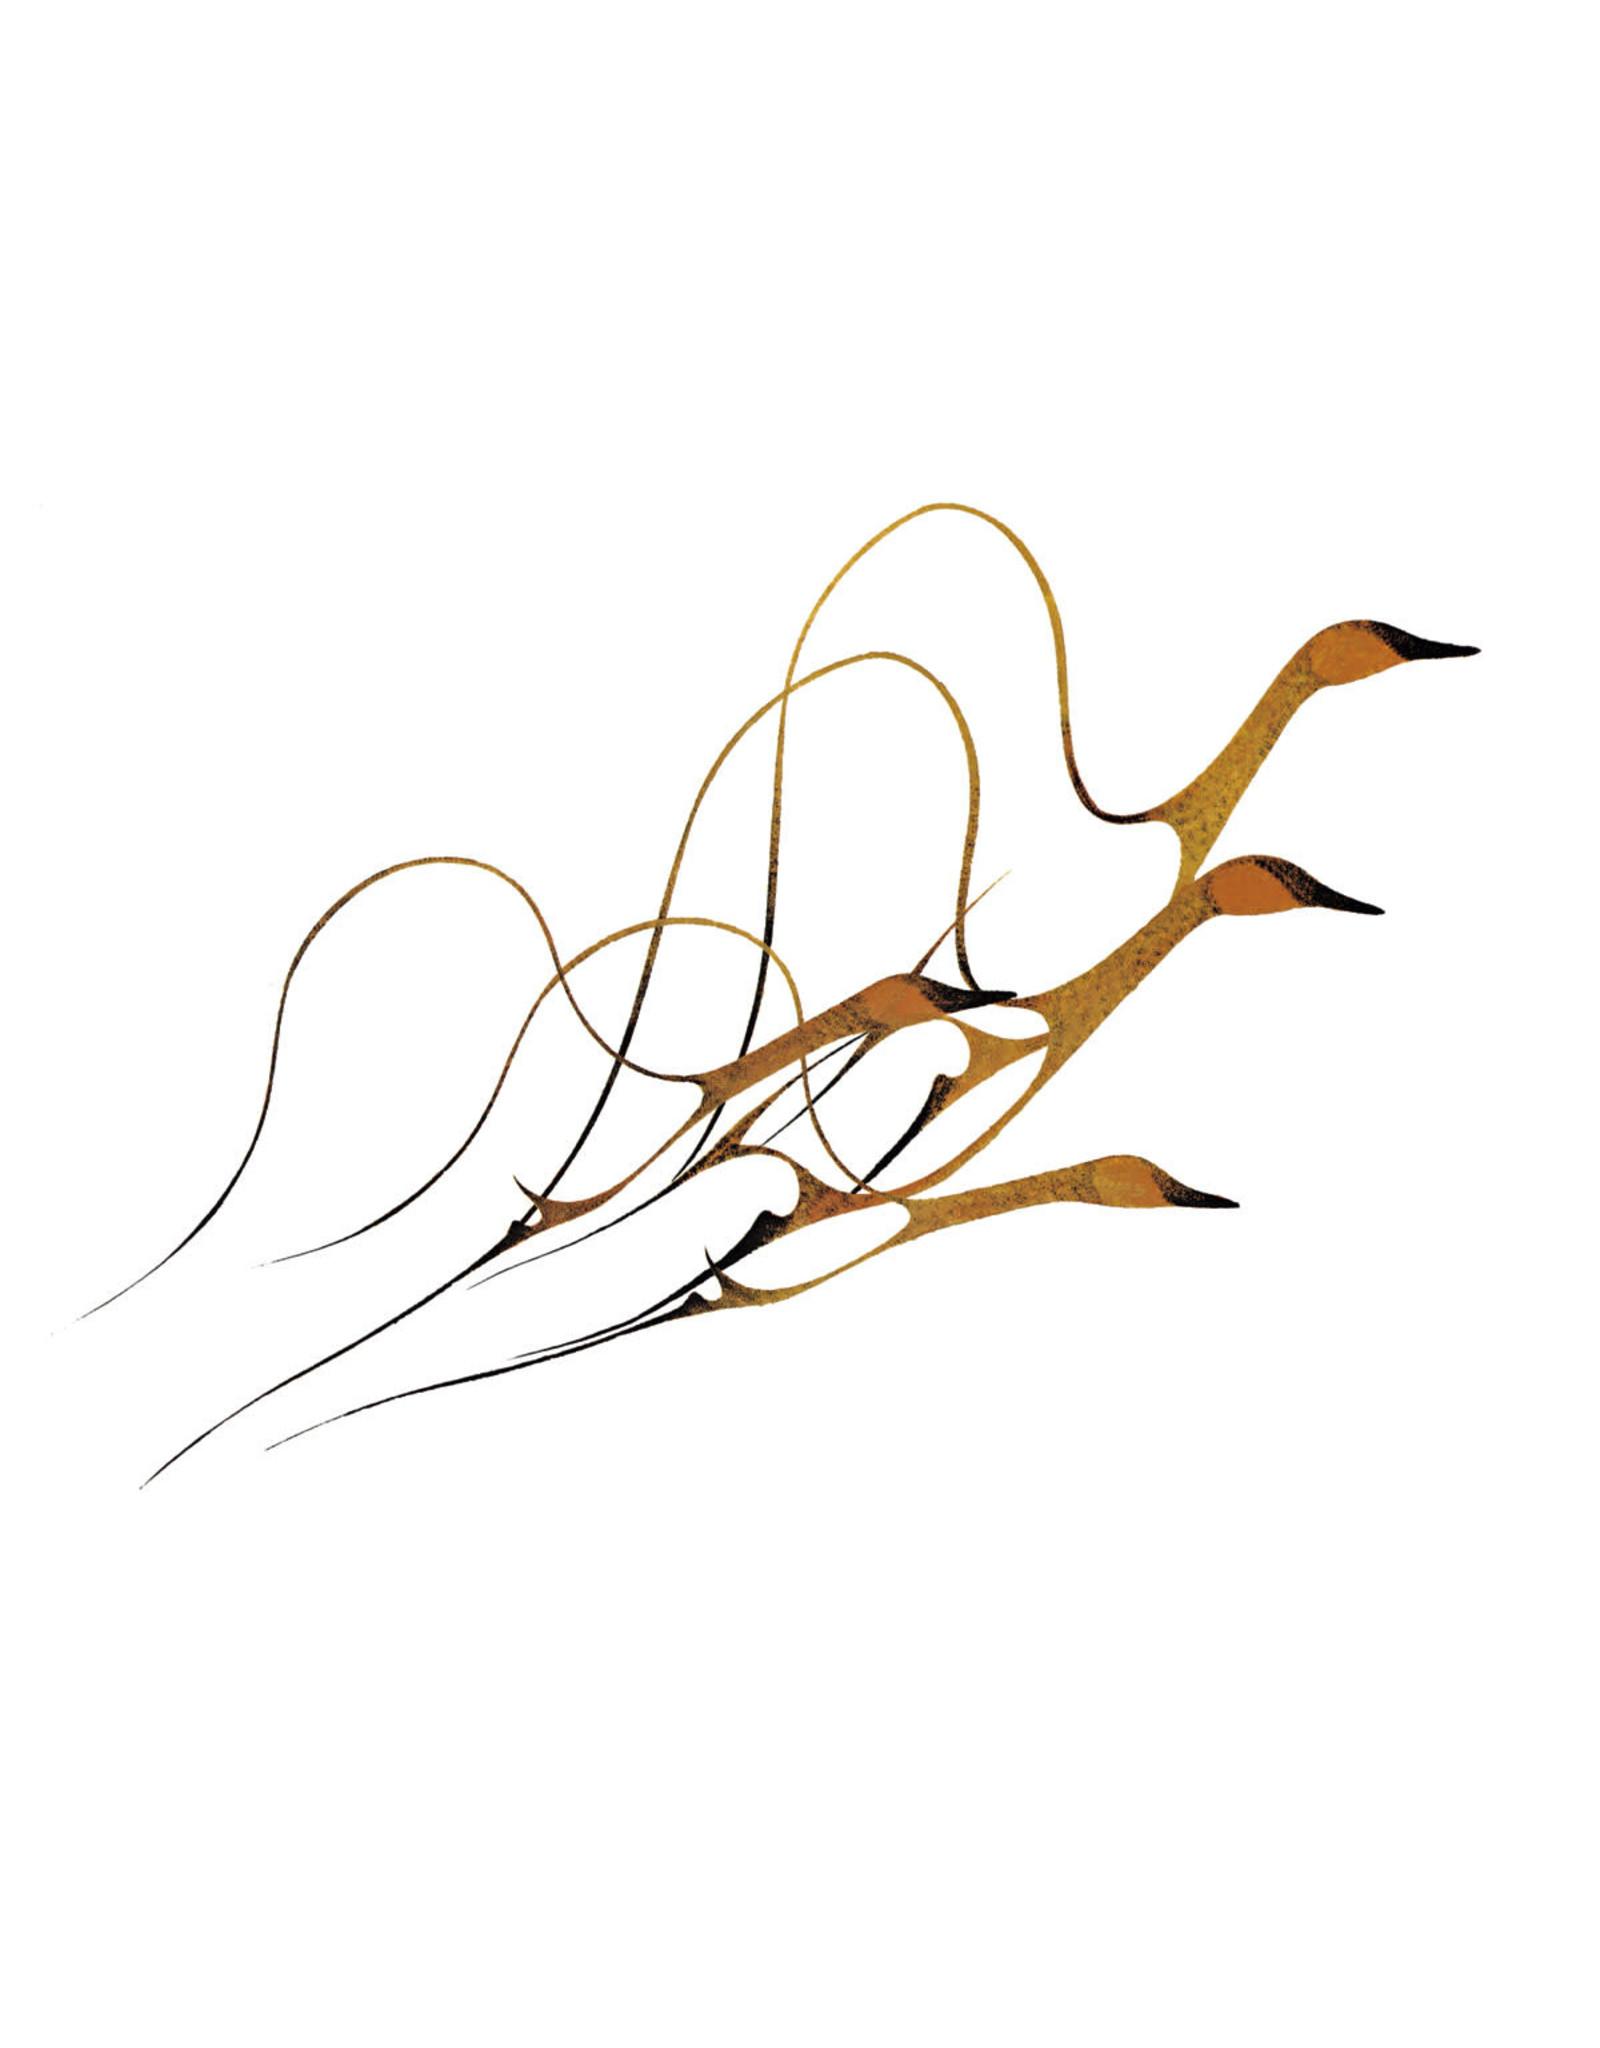 Spring Flight par Benjamin Chee Chee Édition Limitée Encadrée